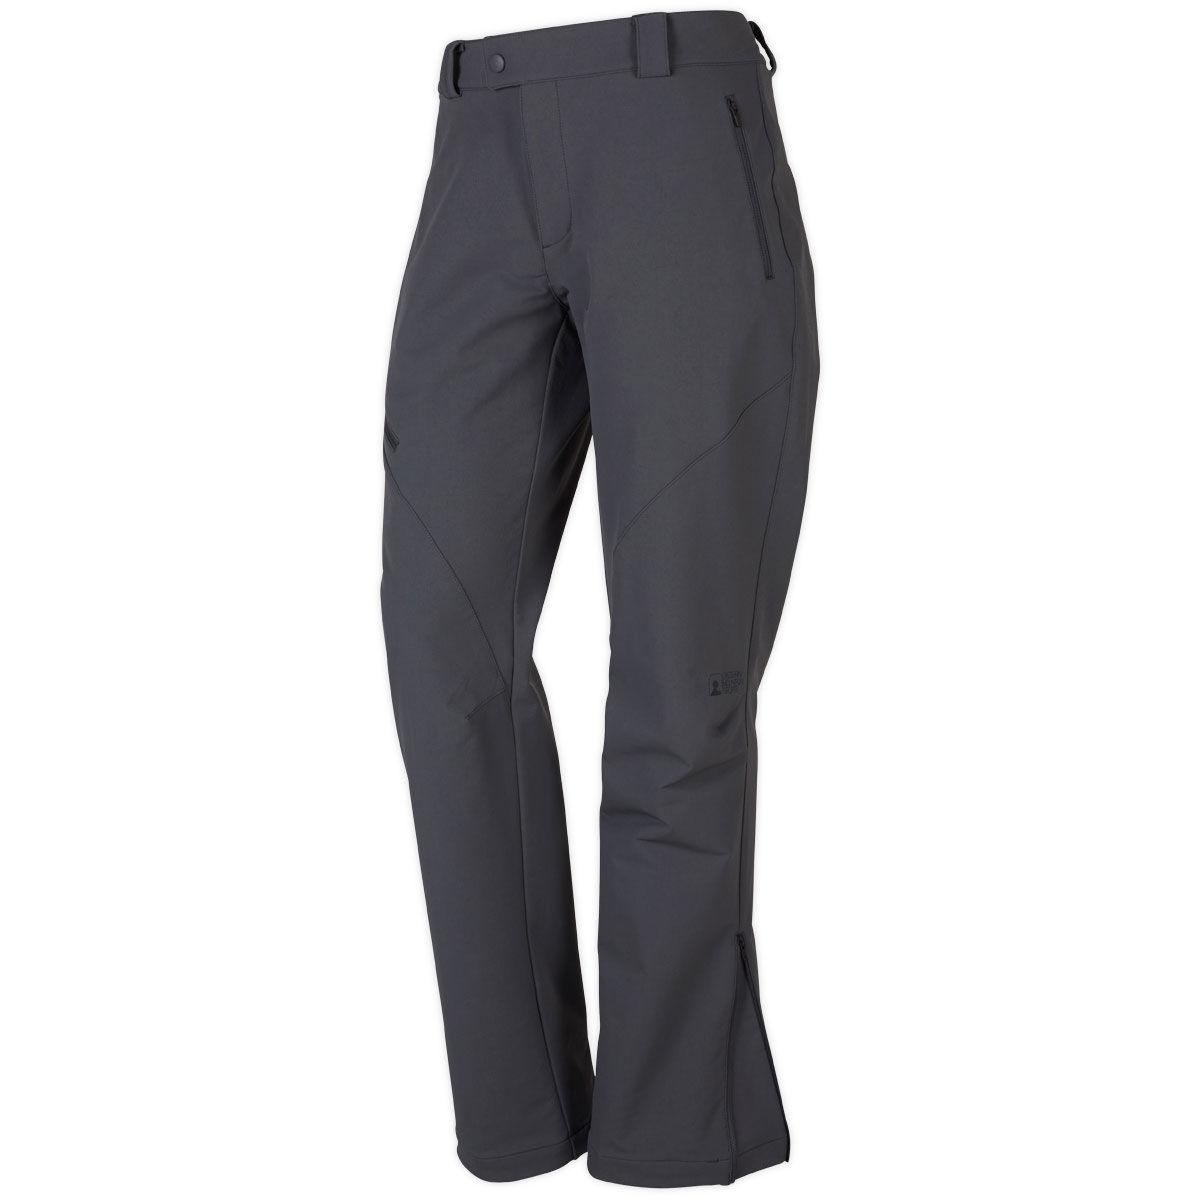 EMS Pinnacle Soft Shell Pants